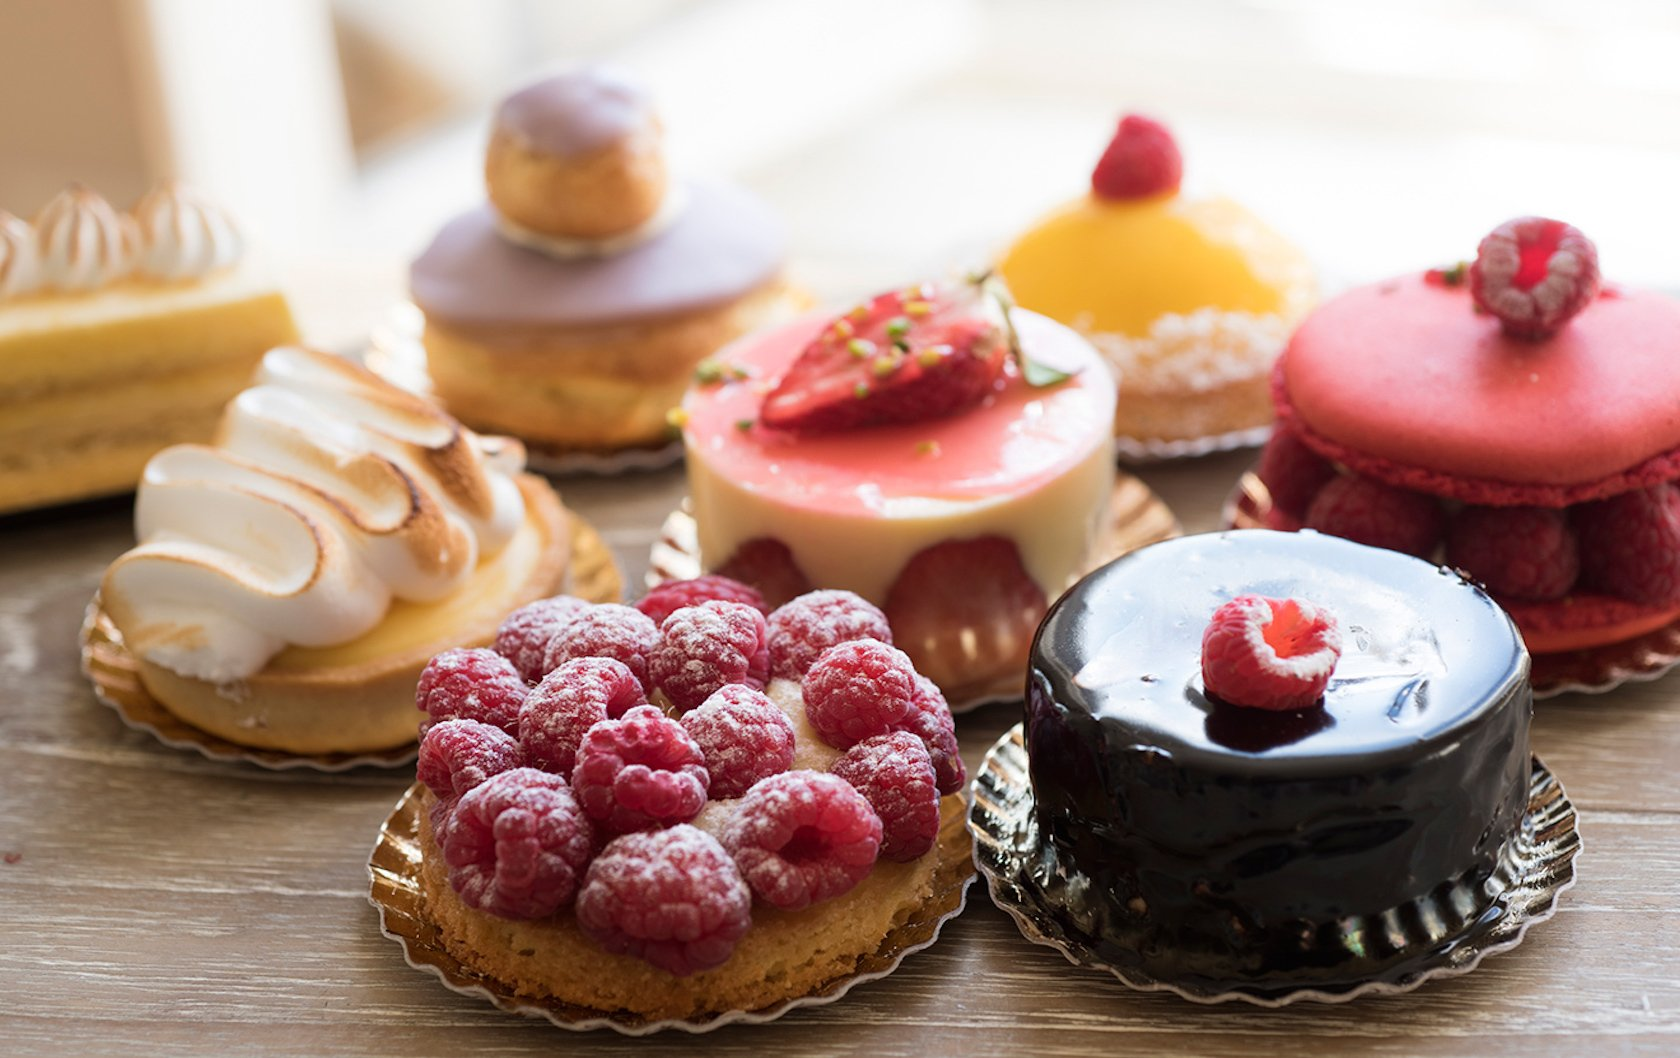 Pastries in Paris: Take a Walk on the Sweet Side in Saint-Germain-des-Prés by Paris Perfect